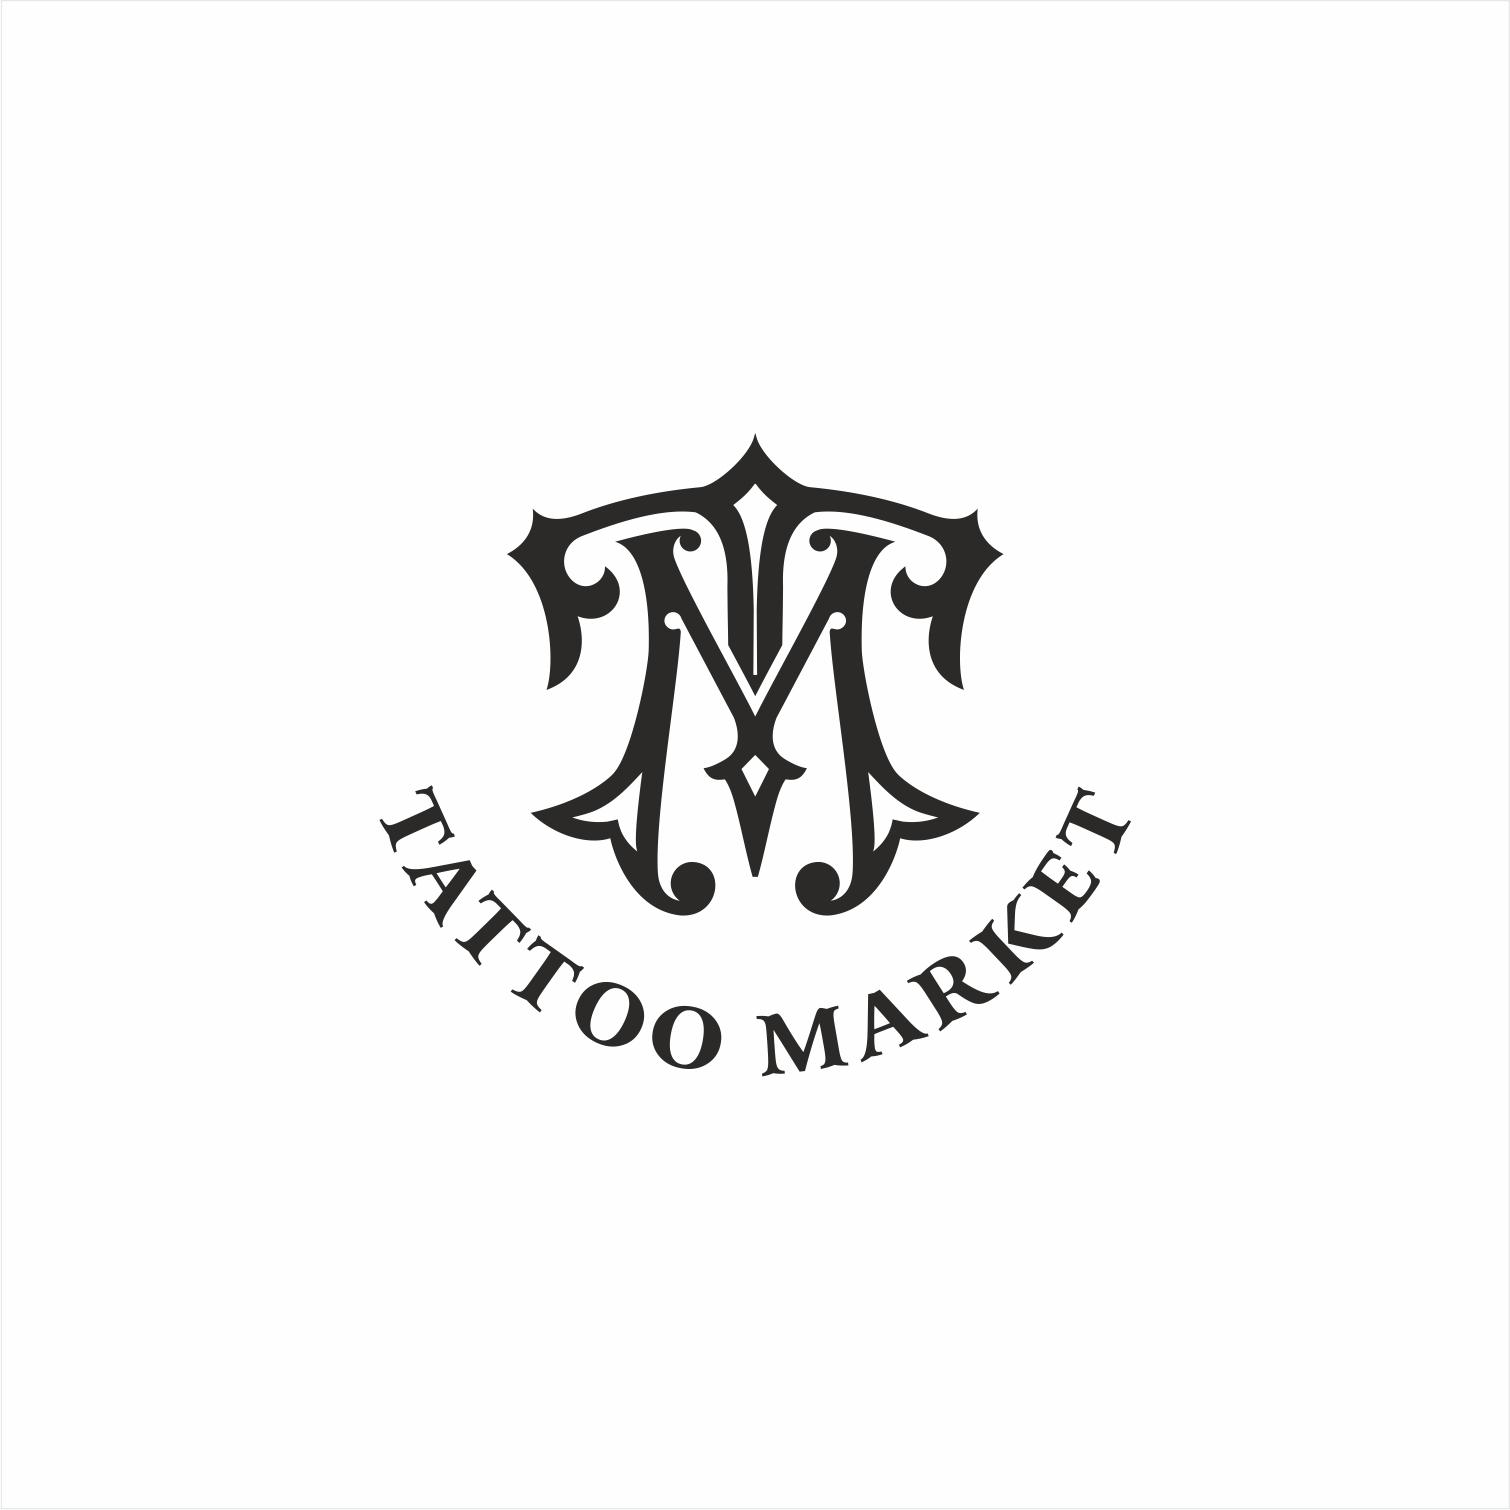 Редизайн логотипа магазина тату оборудования TattooMarket.ru фото f_4905c4403e11d82c.jpg